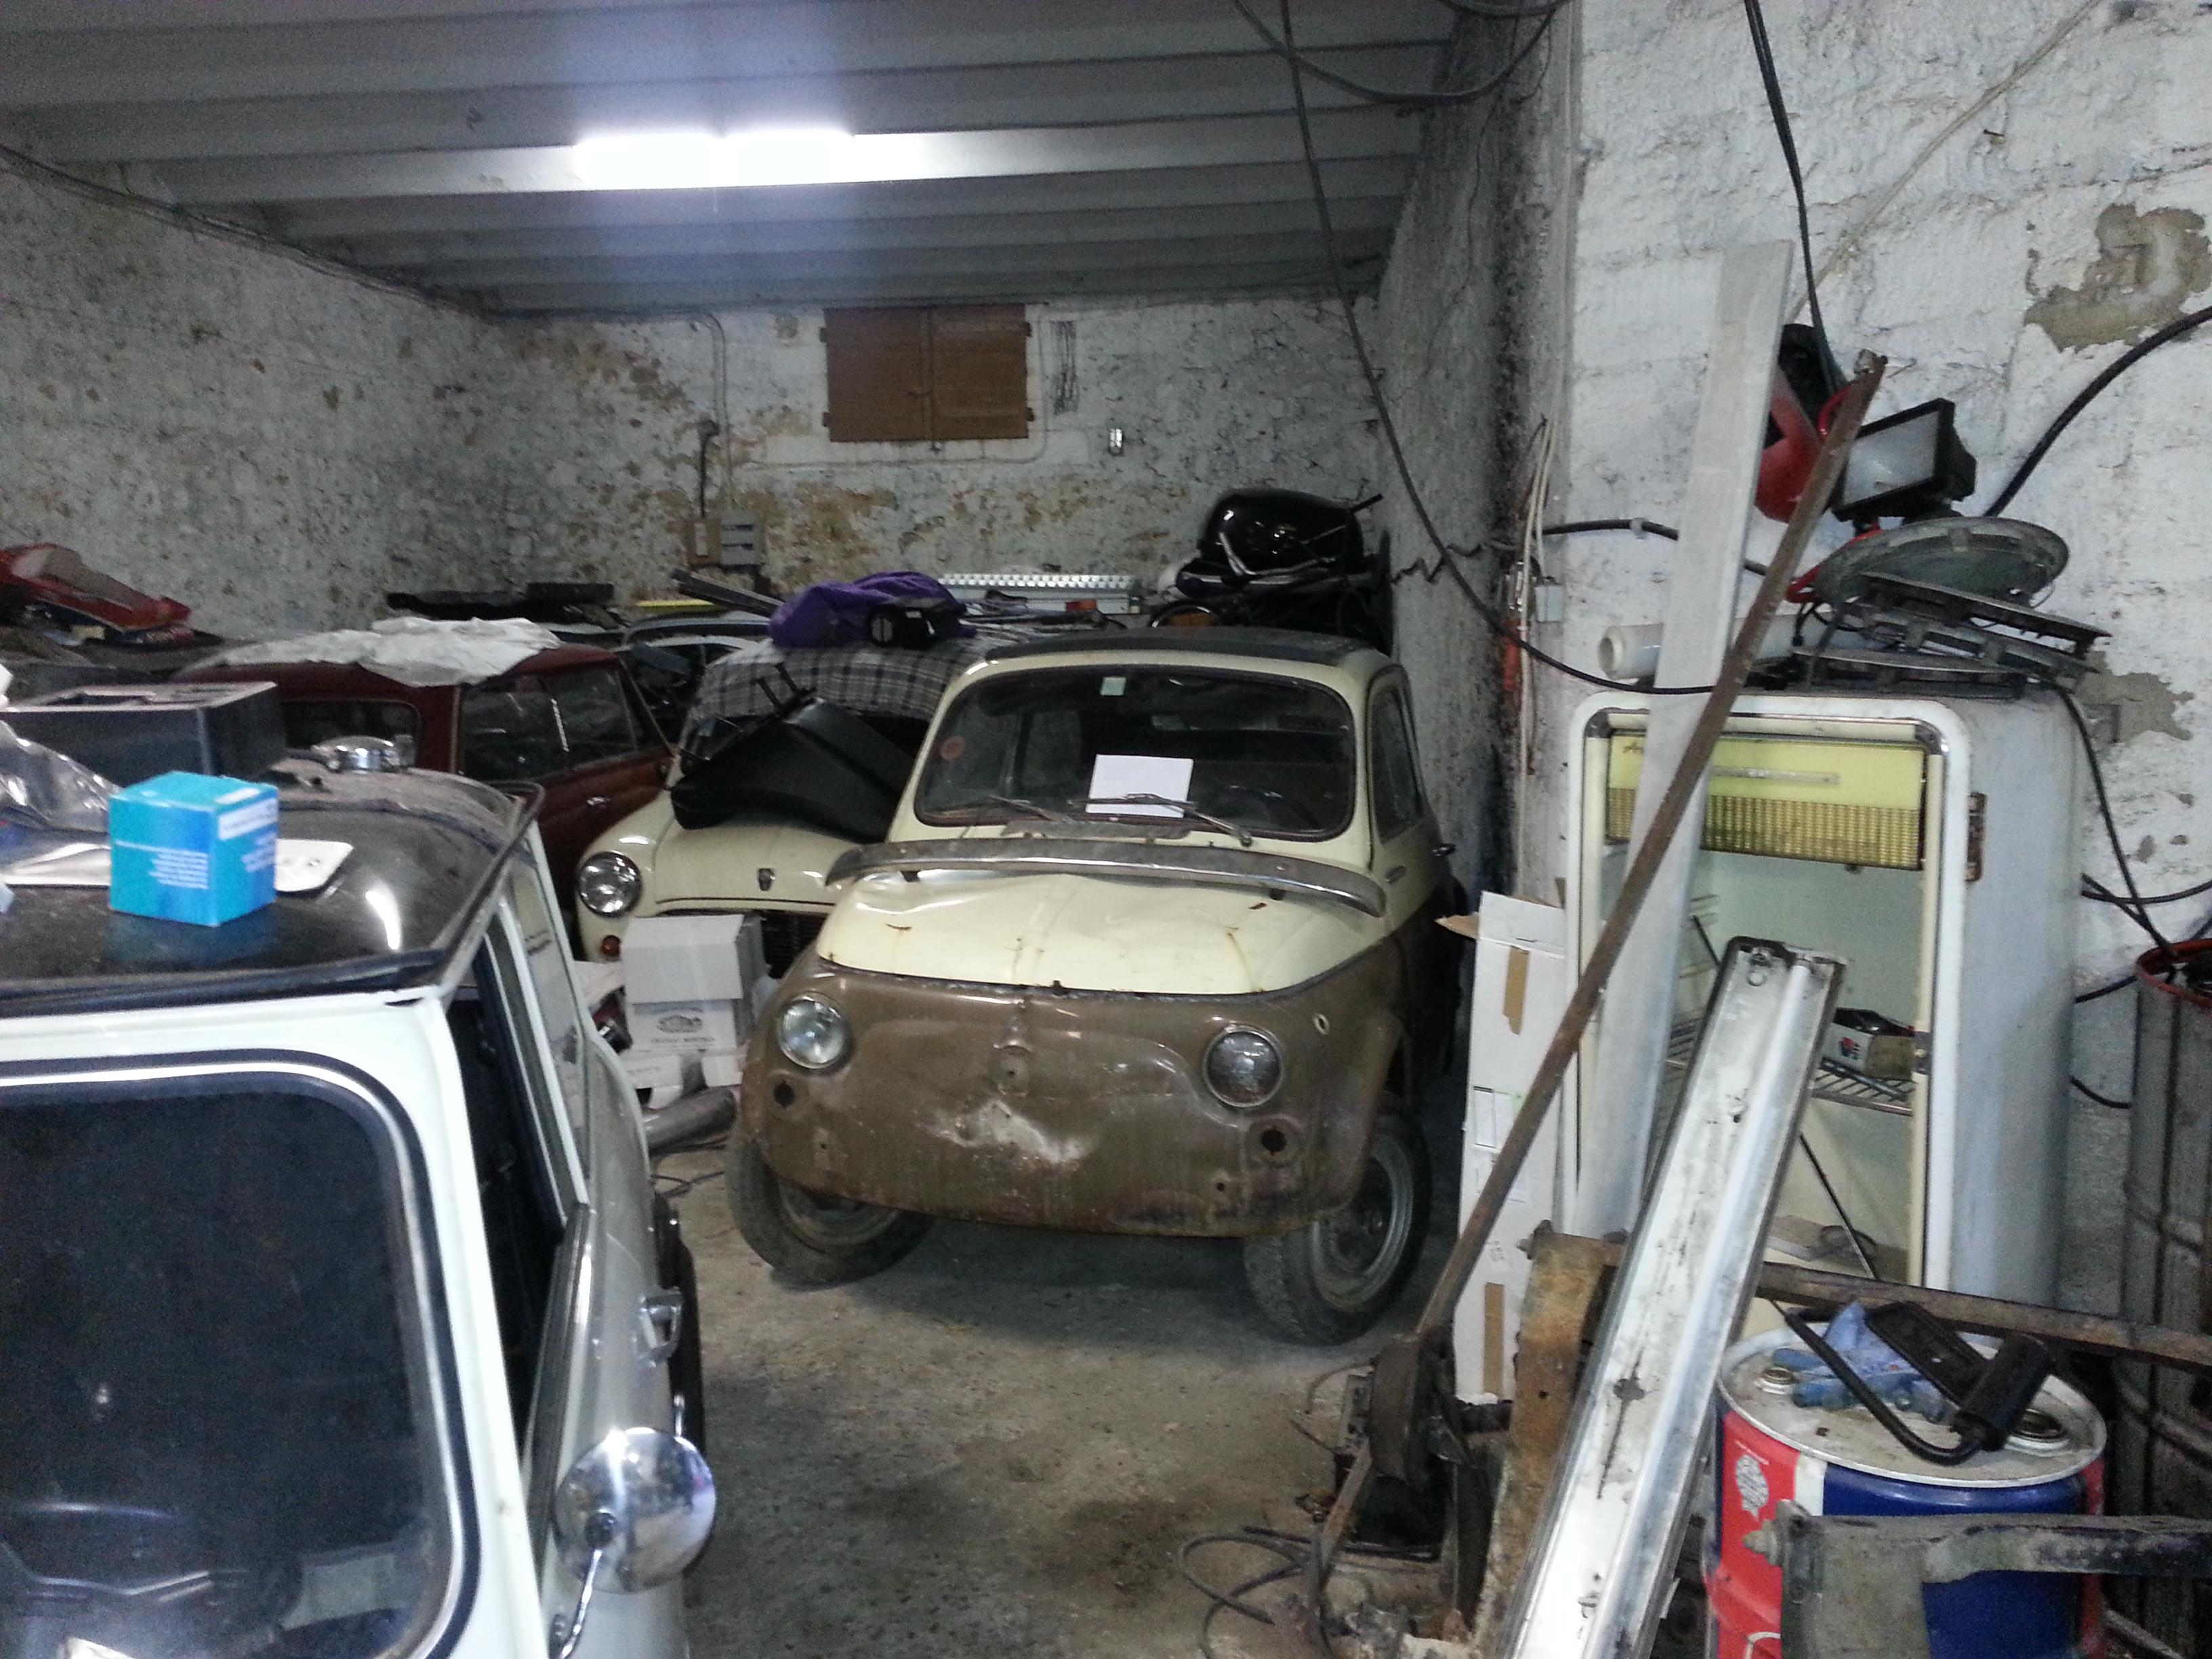 restauration fiat 500 brice collot voitures anciennes. Black Bedroom Furniture Sets. Home Design Ideas